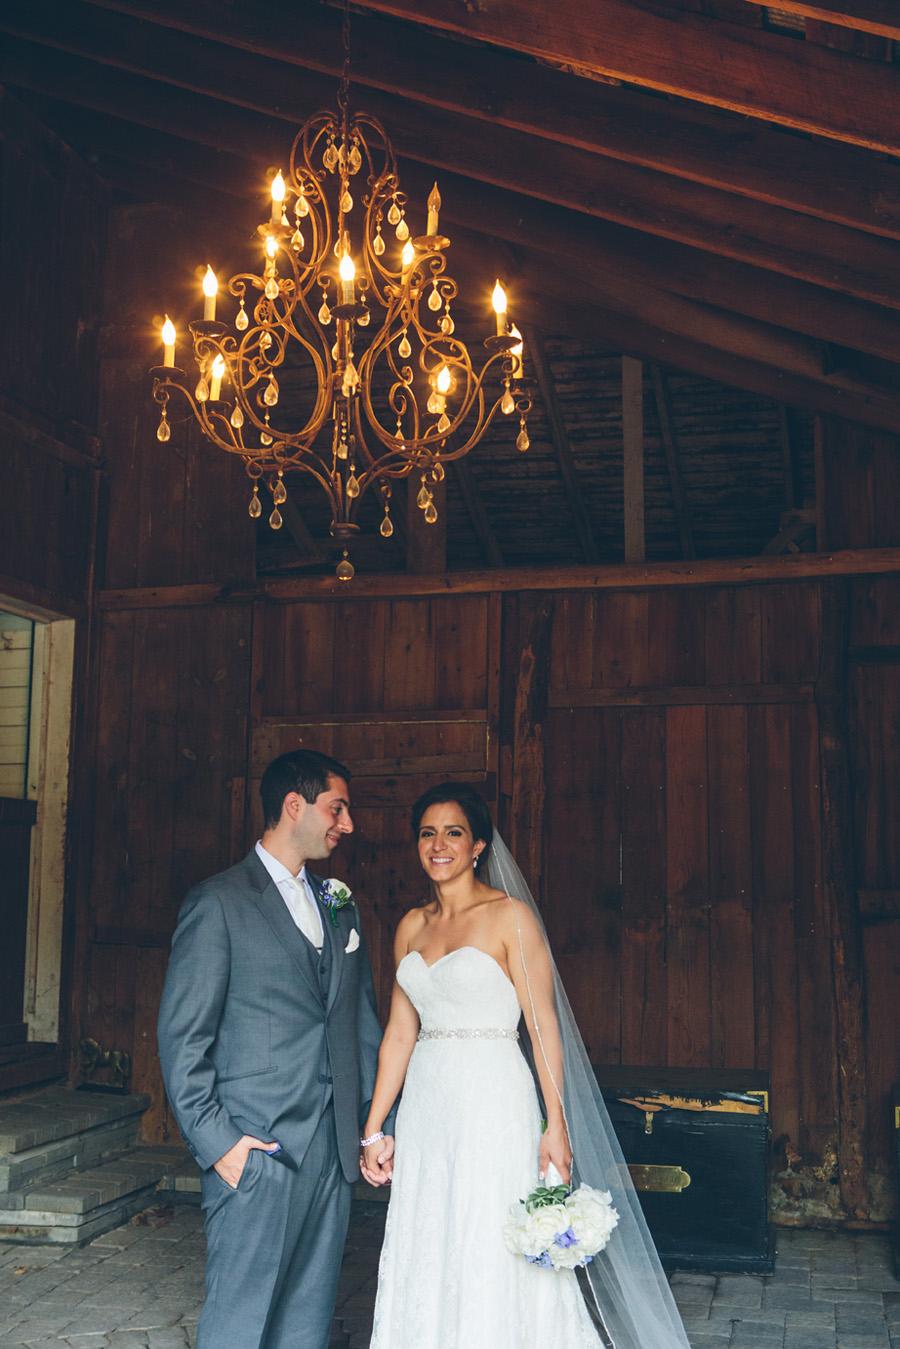 sarajon-nyc-wedding-cynthiachung-blog-0020